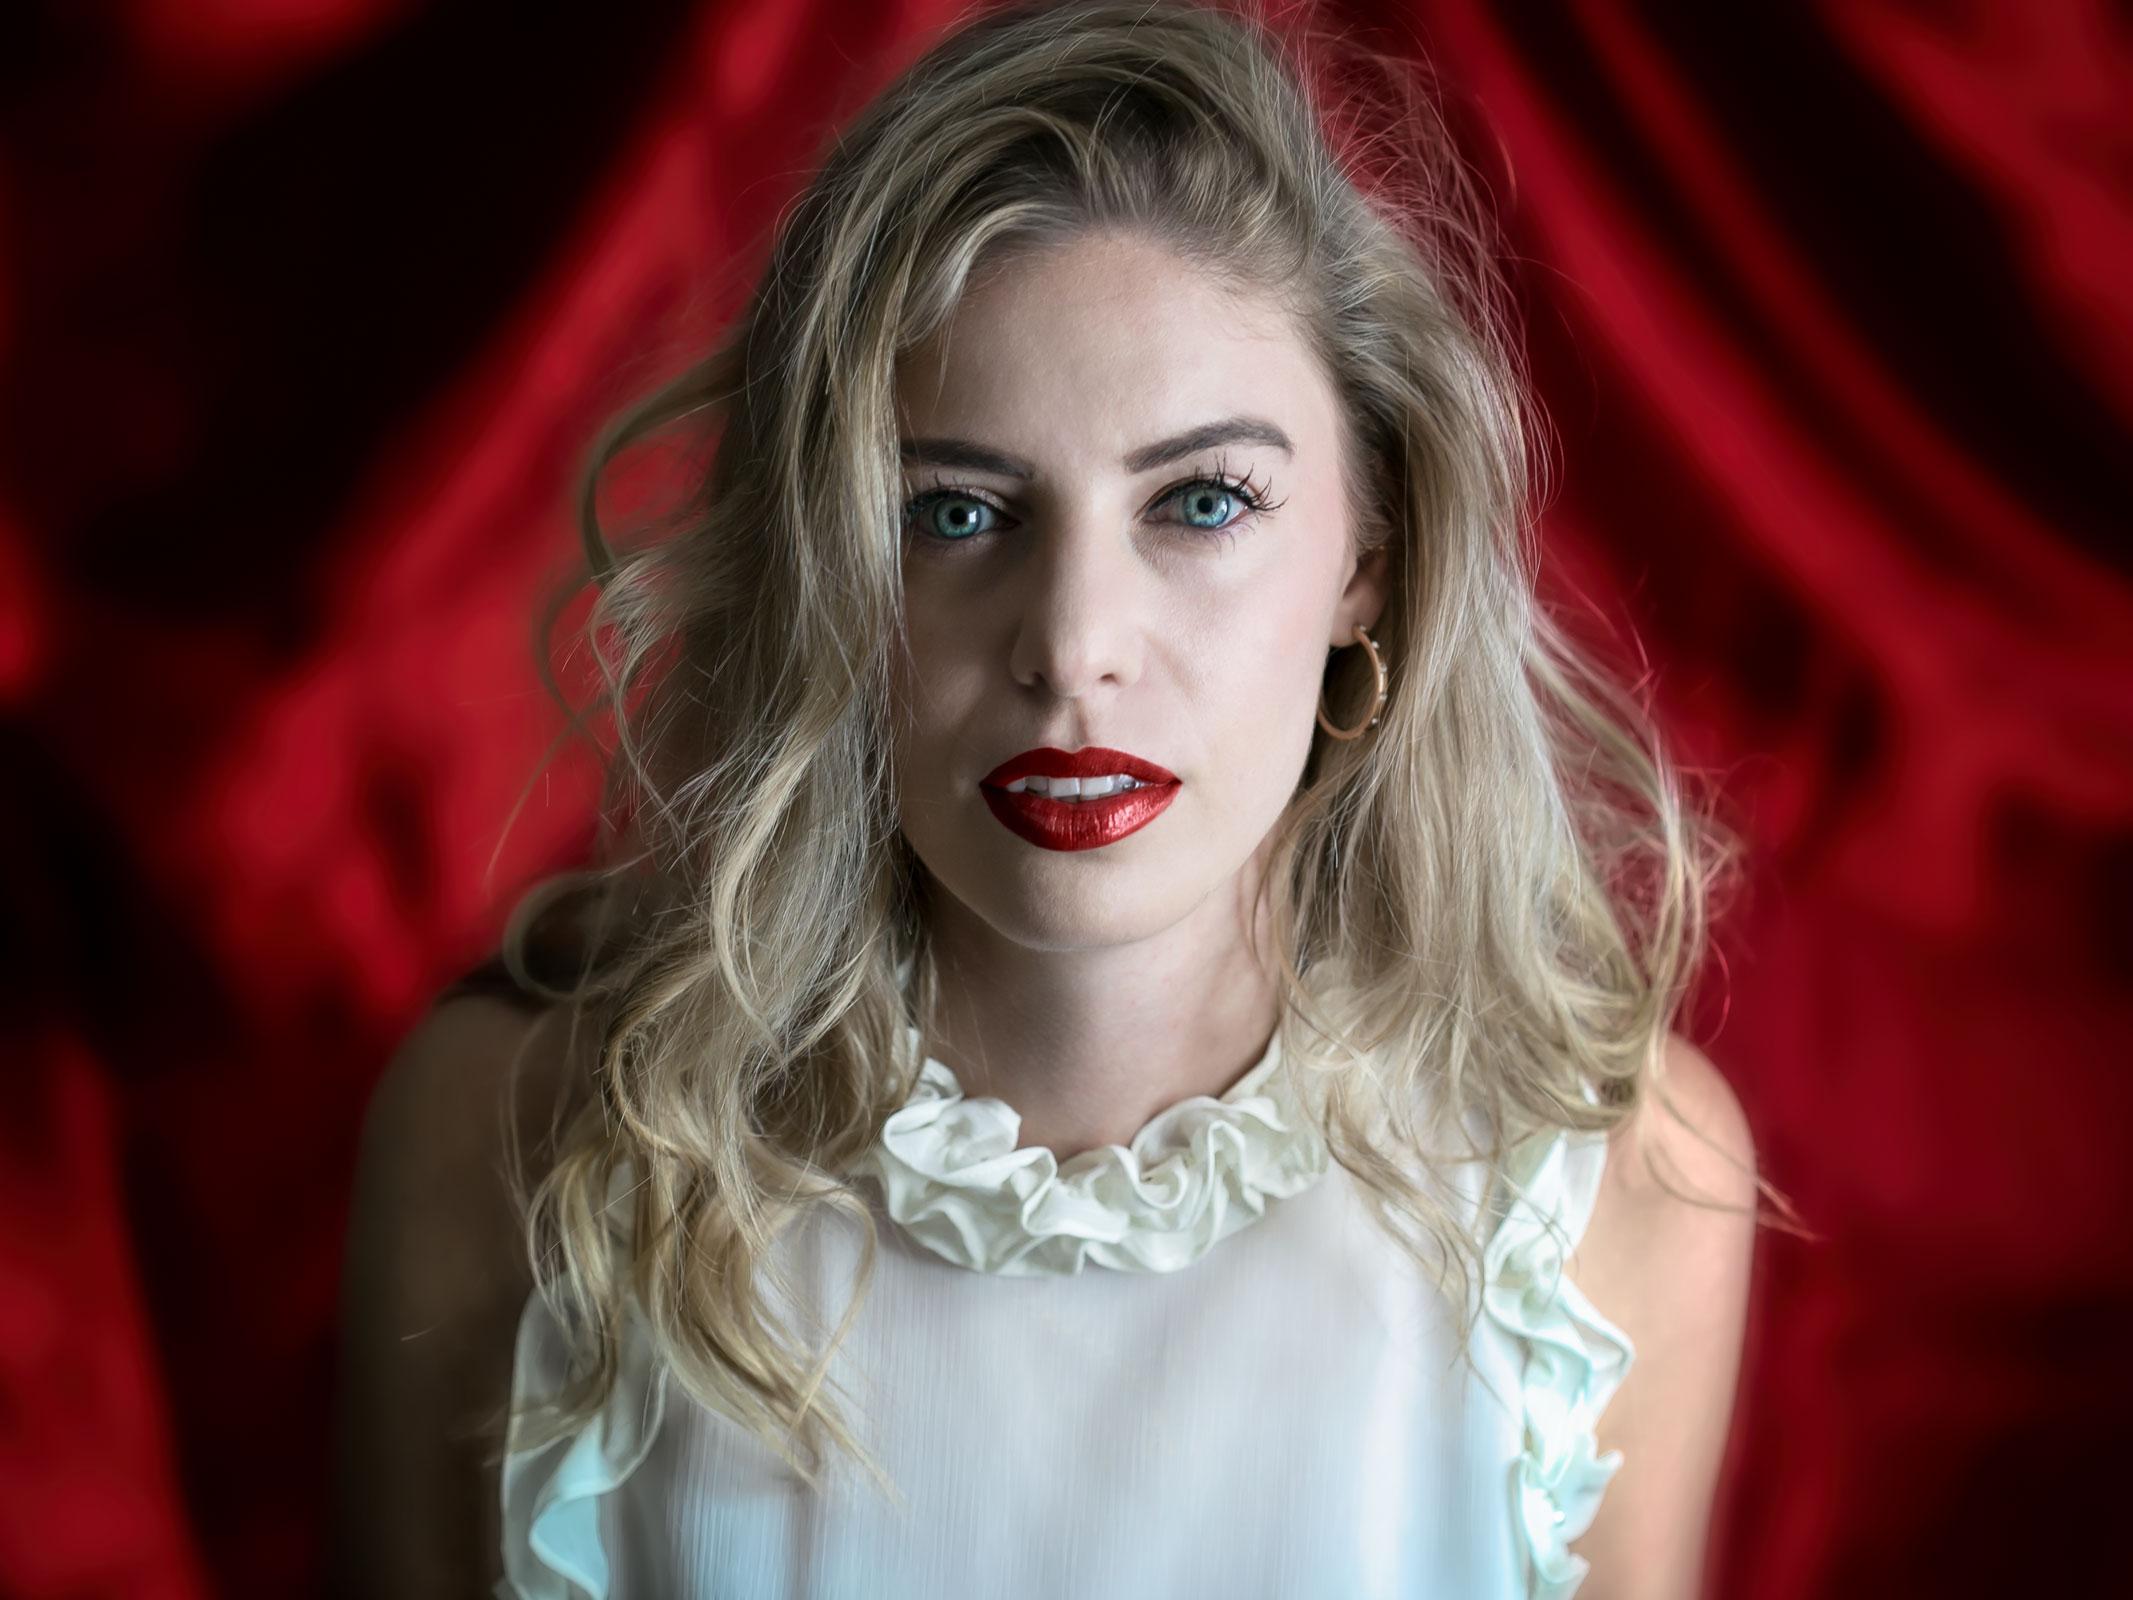 rote lippen bilifotos.ch-beauty-Fotograf+Luzern+Beauty+Fotoshooting